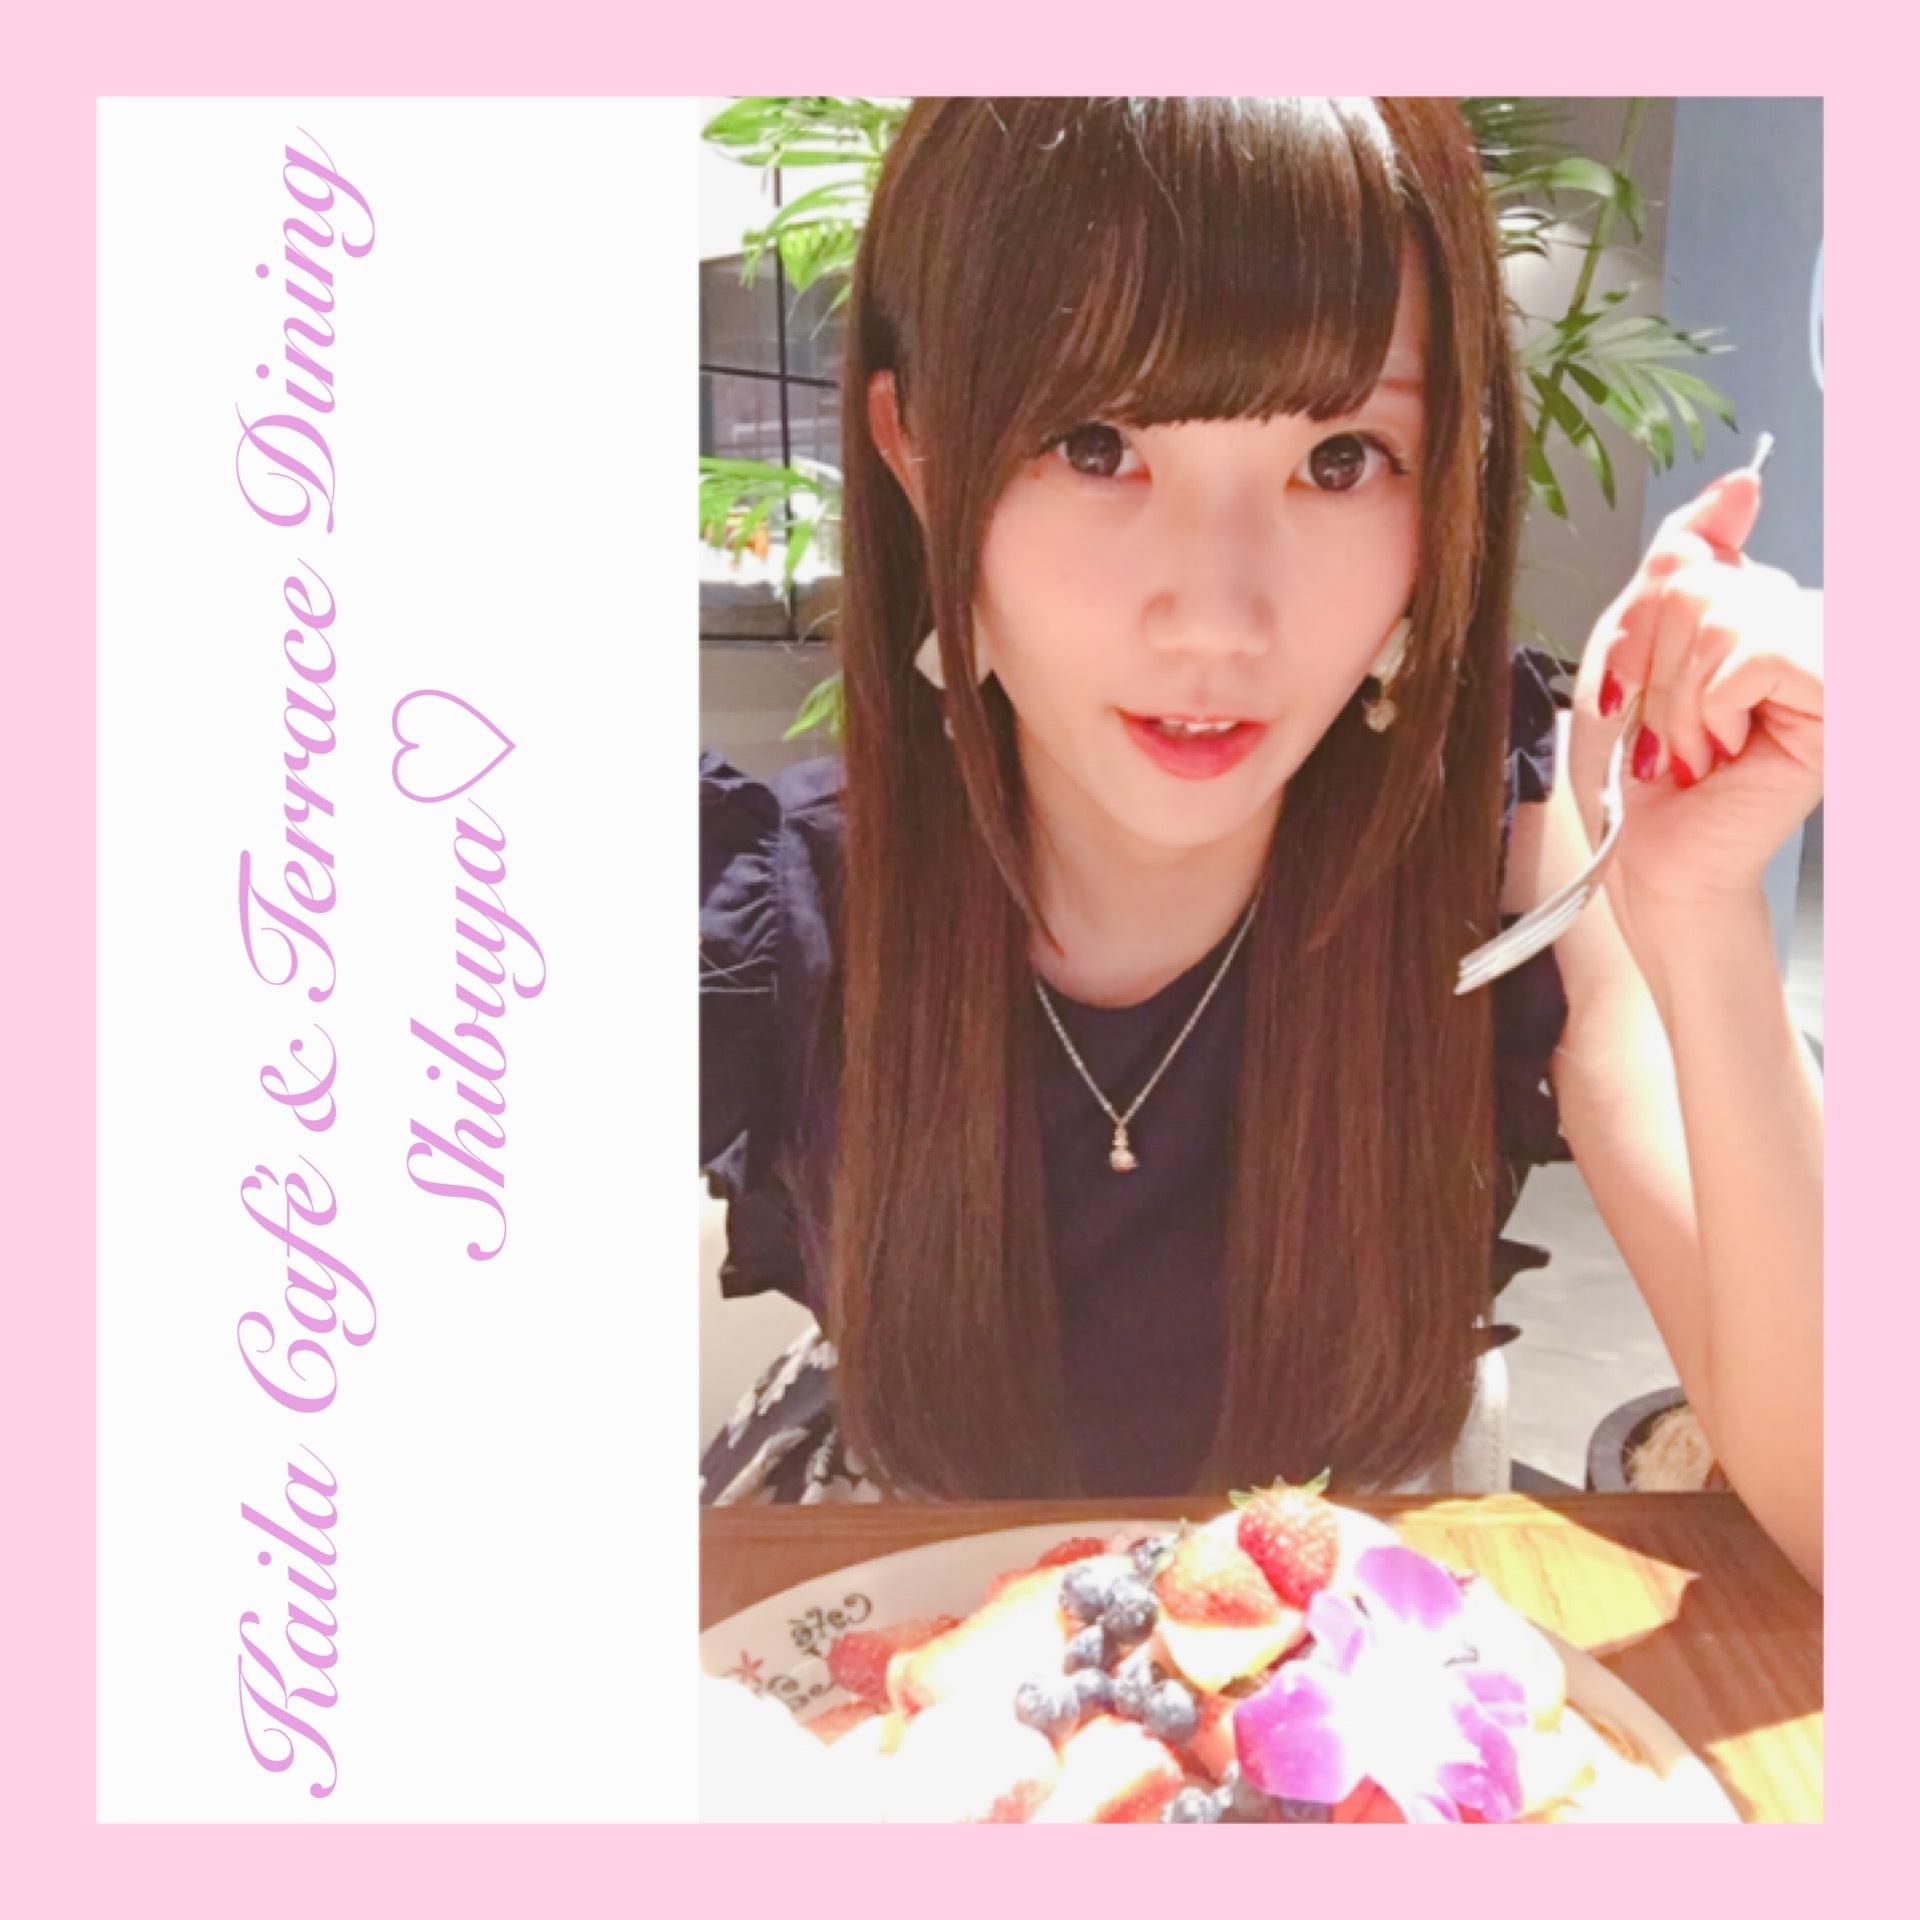 《Kaila Café & Terrace Dining Shibuya》オリジナルパンケーキ♫♡_1_2-2